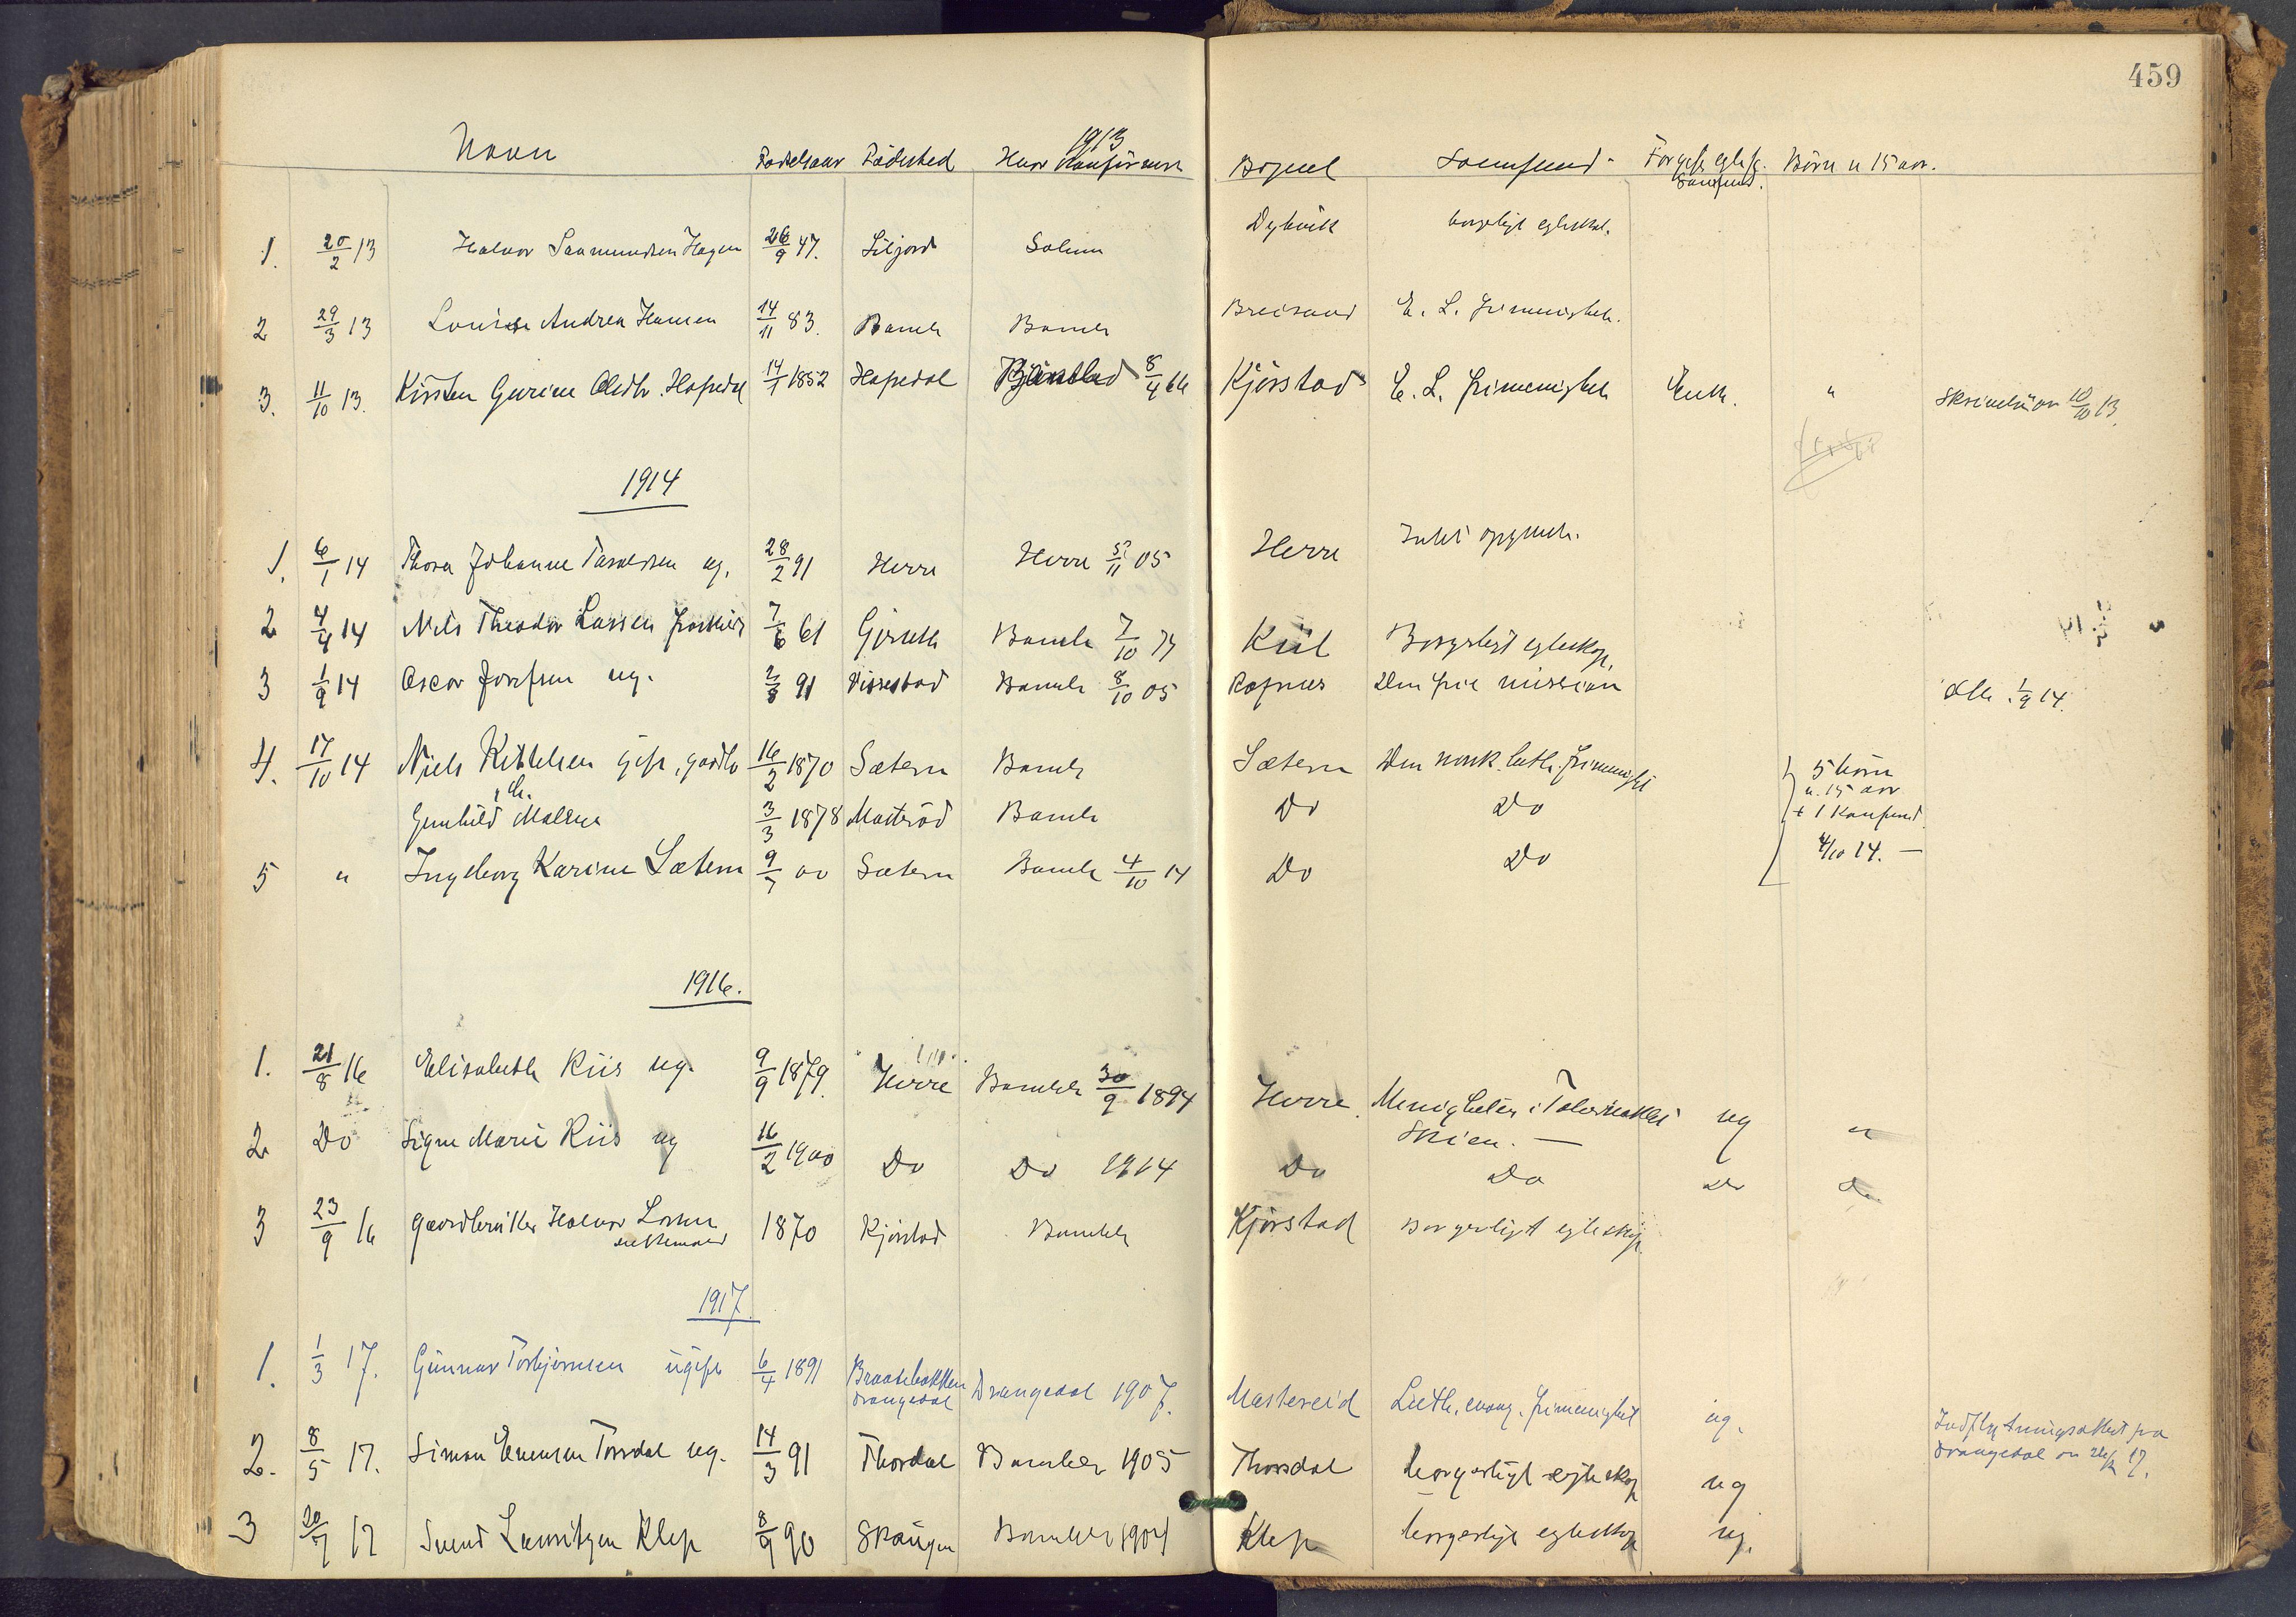 SAKO, Bamble kirkebøker, F/Fa/L0009: Ministerialbok nr. I 9, 1901-1917, s. 459